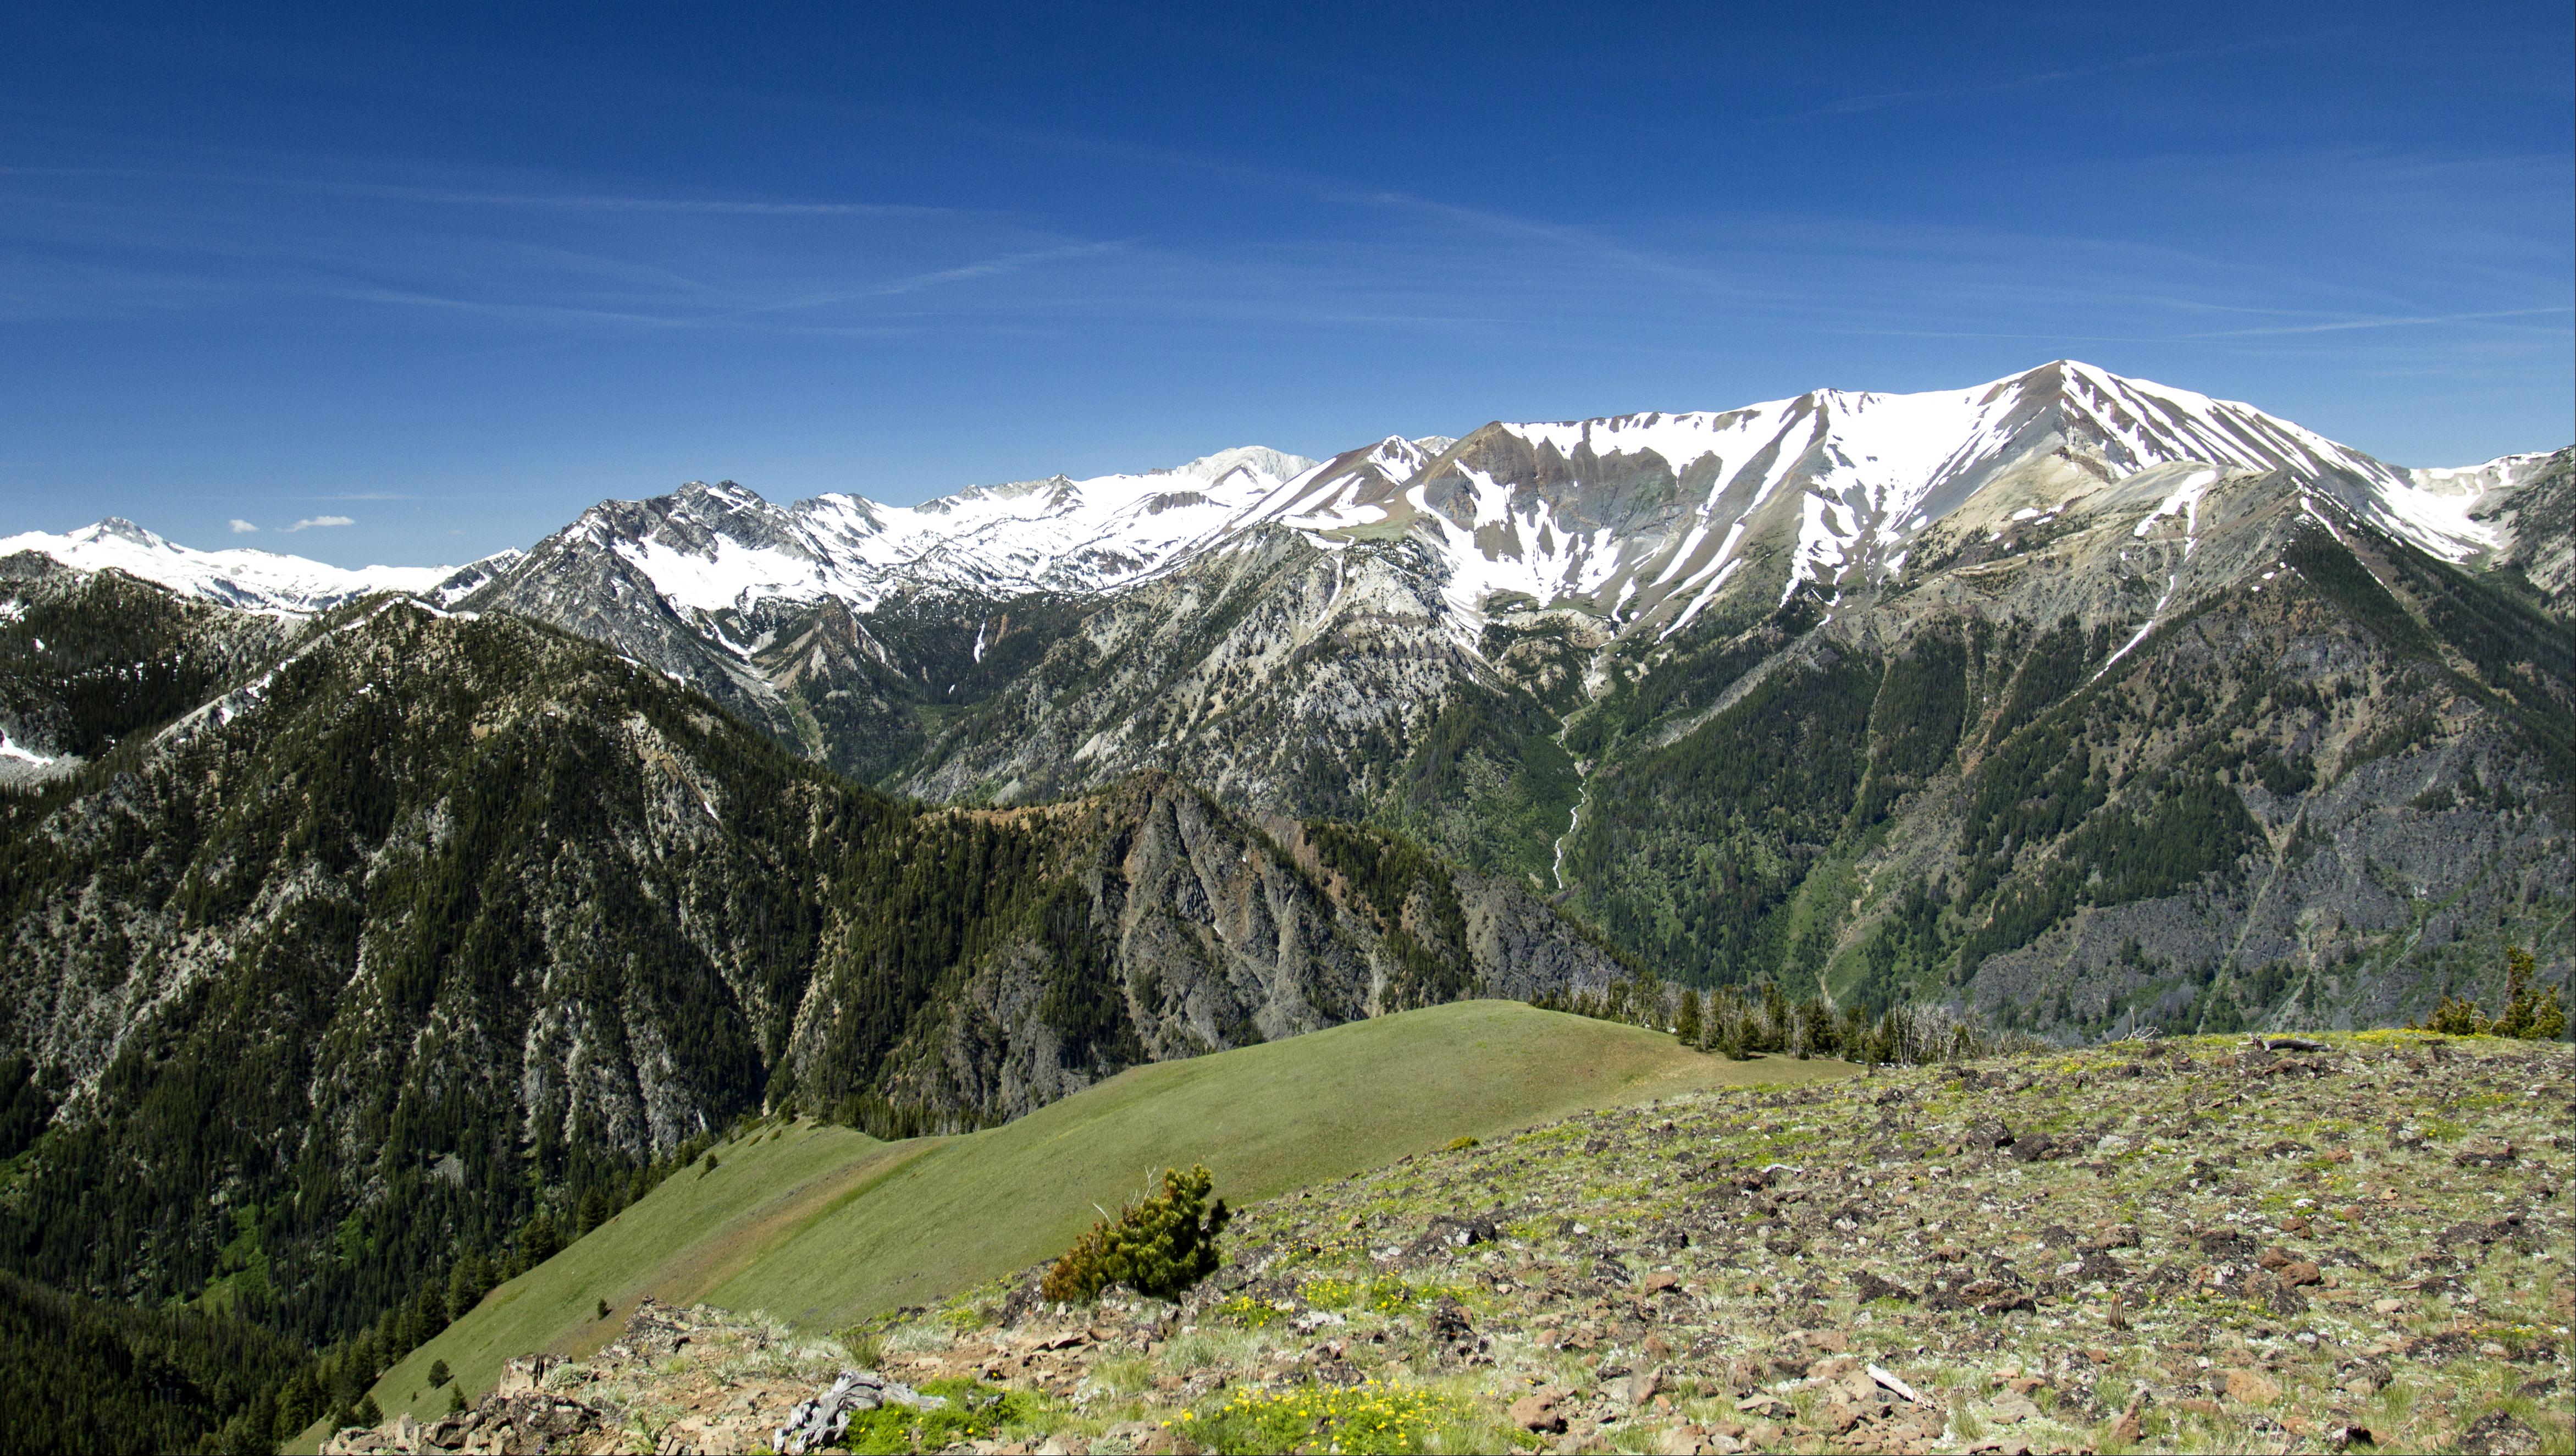 Eagle Cap Wilderness, Oregon, Cap, Oregon, Wildflowers, Wilderness, HQ Photo